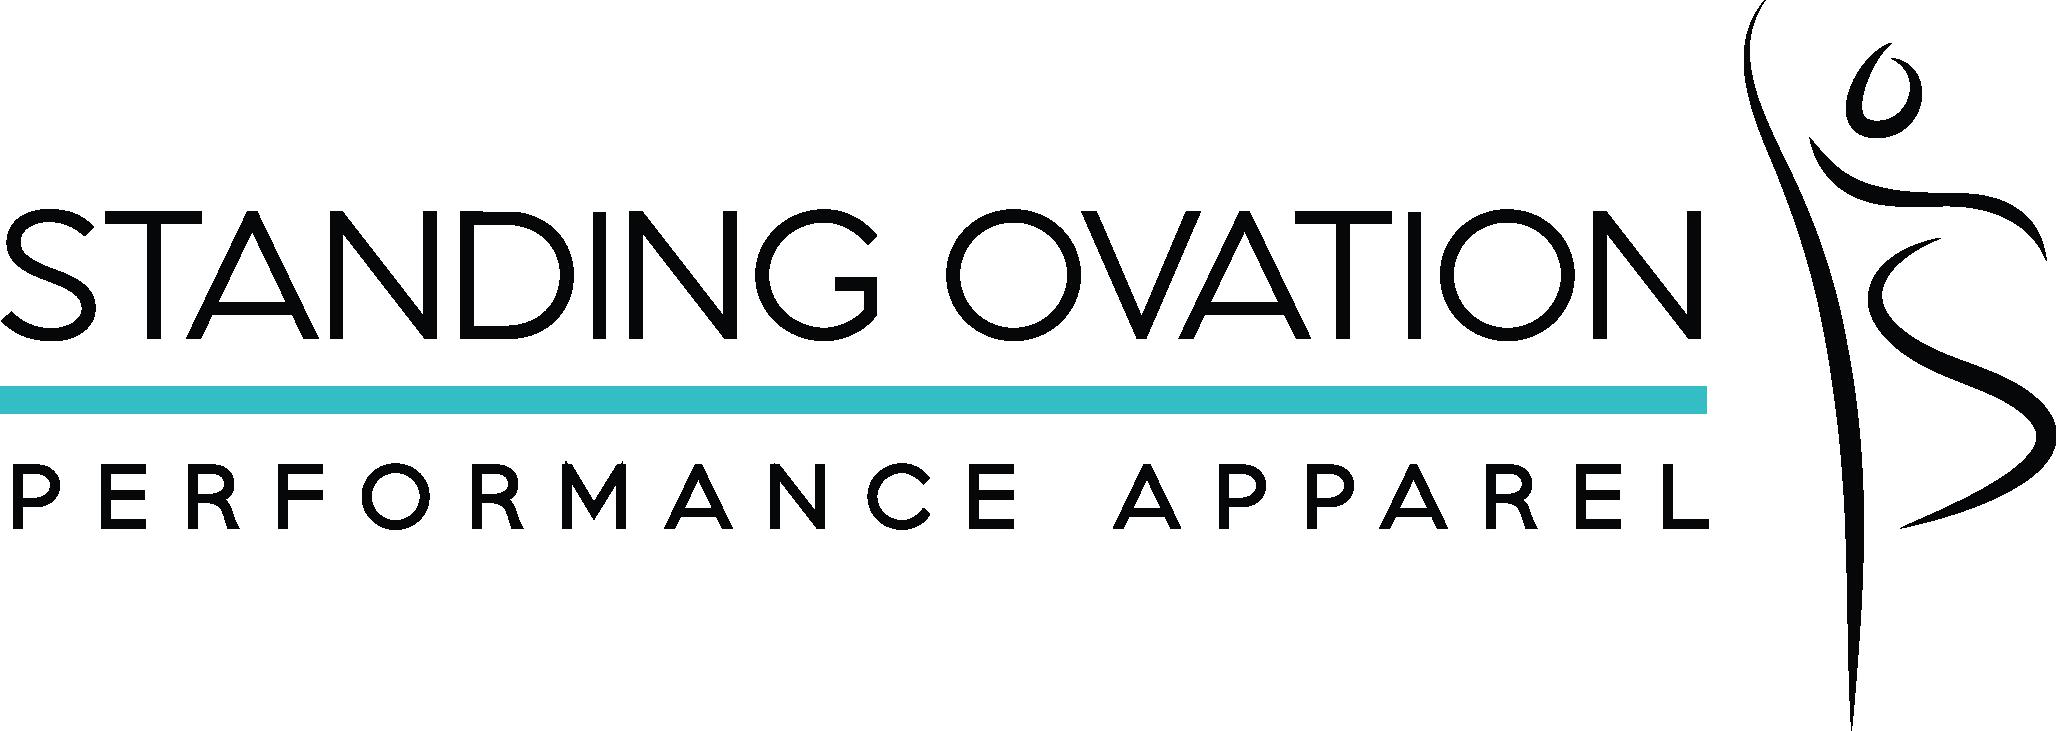 Standing Ovation Performance Apparel Logo